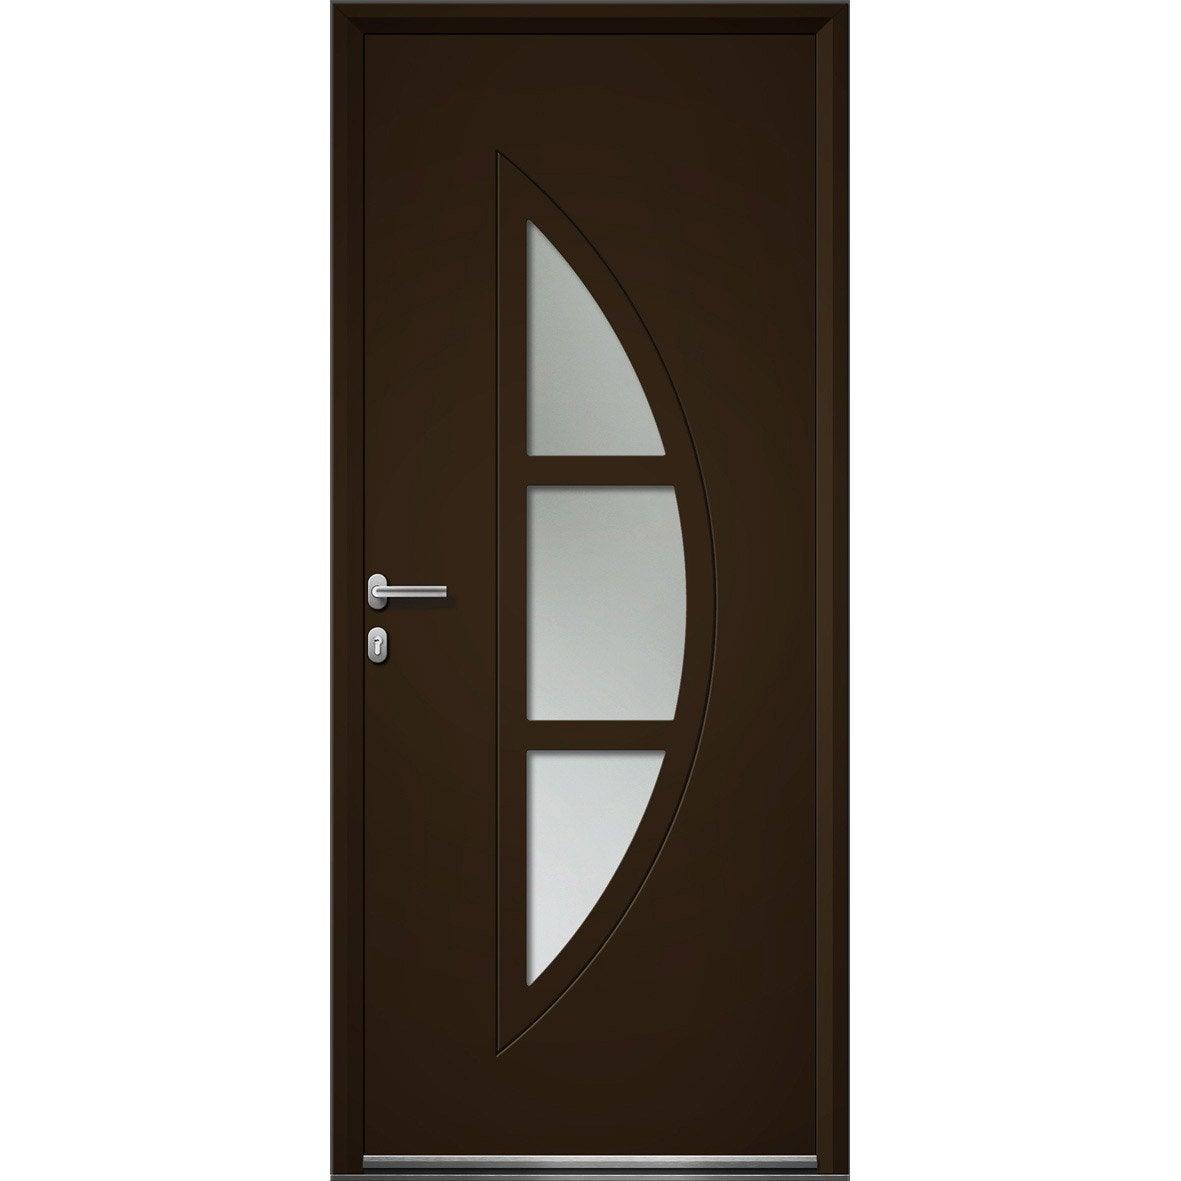 Porte d 39 entr e sur mesure en aluminium omaha artens for Carrelage porte d entree